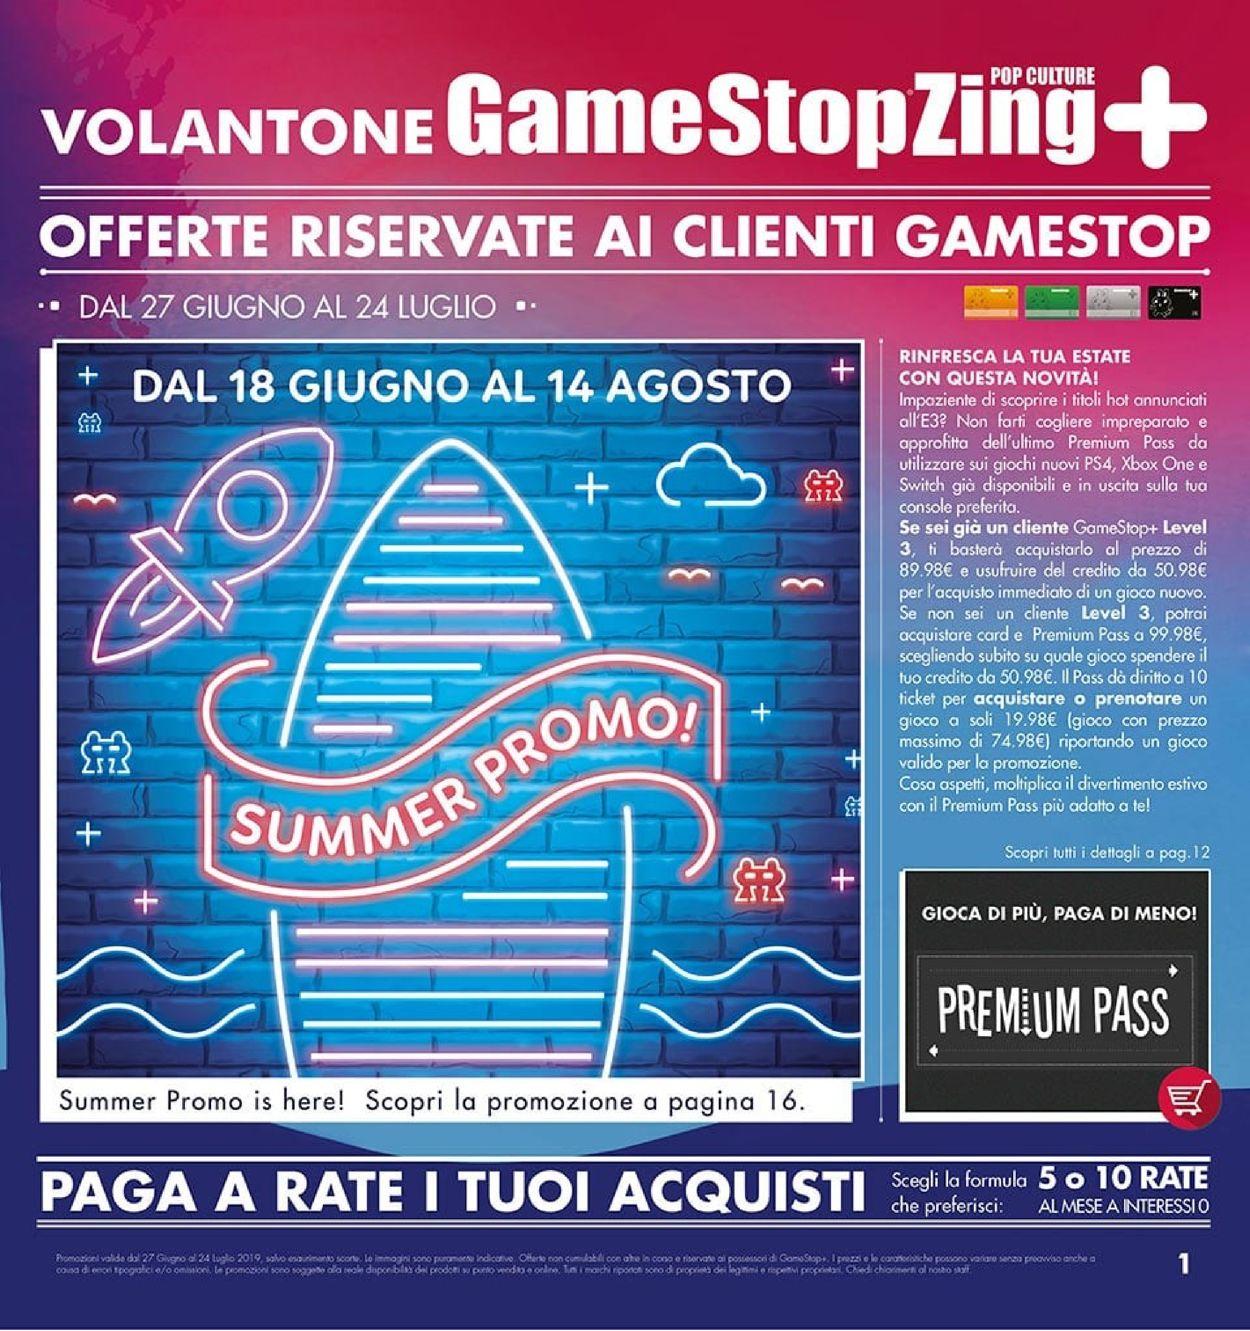 Volantino Gamestop - Offerte 27/06-24/07/2019